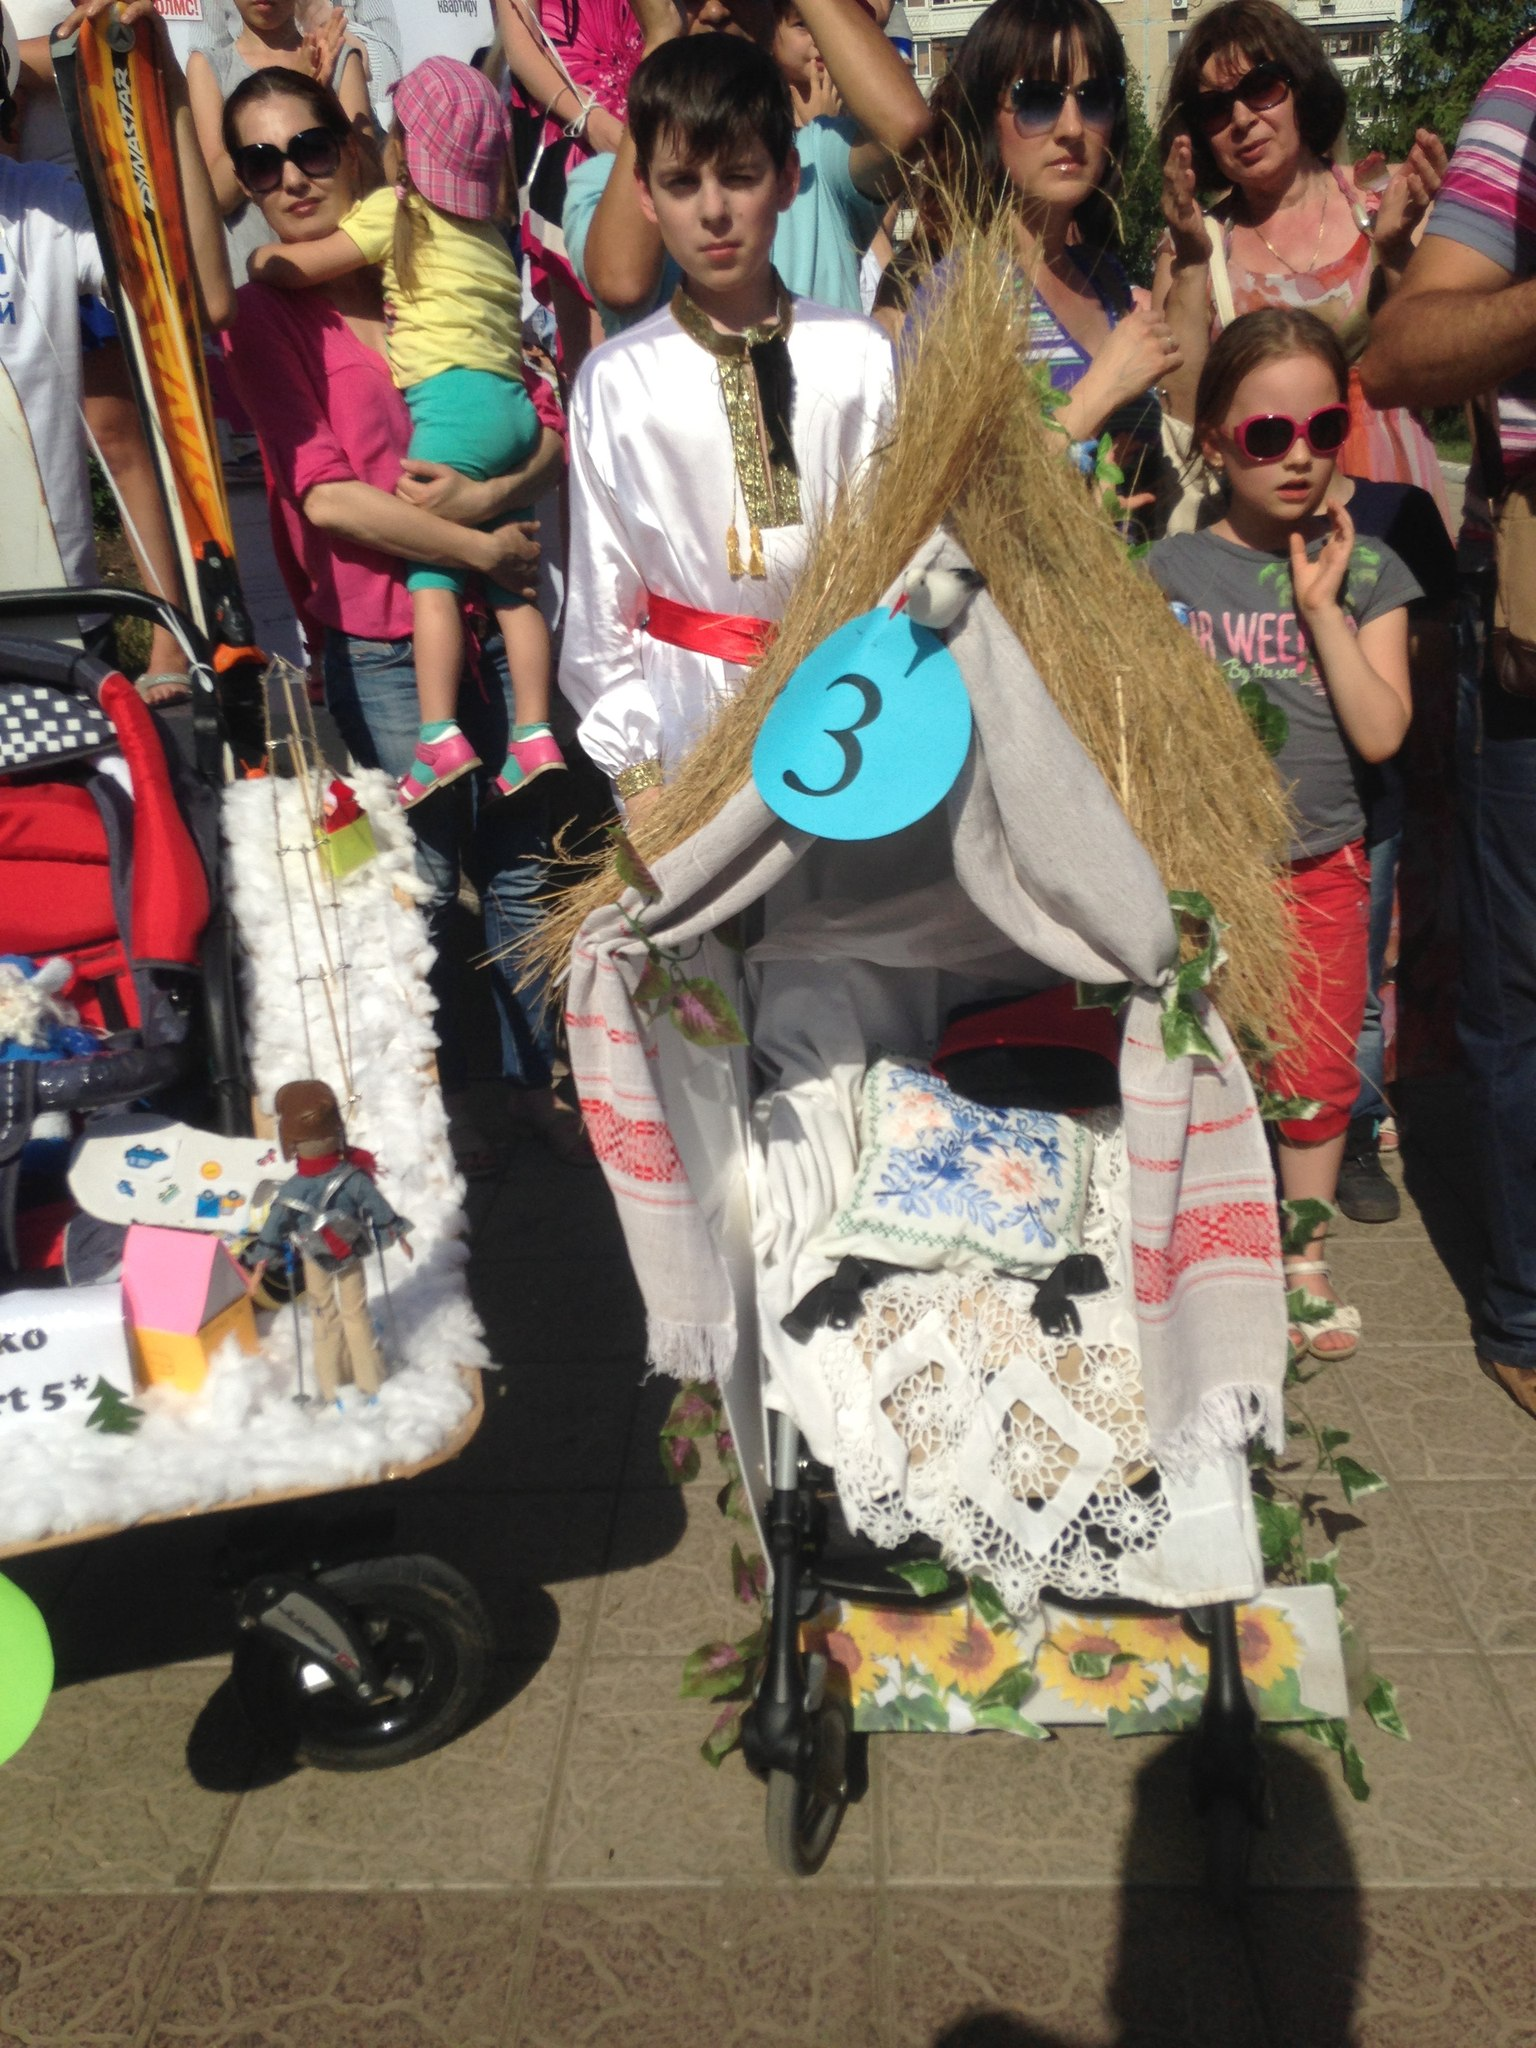 Парад колясок 2014 (19 июля) - Страница 2 3EJ0nlOn1wY